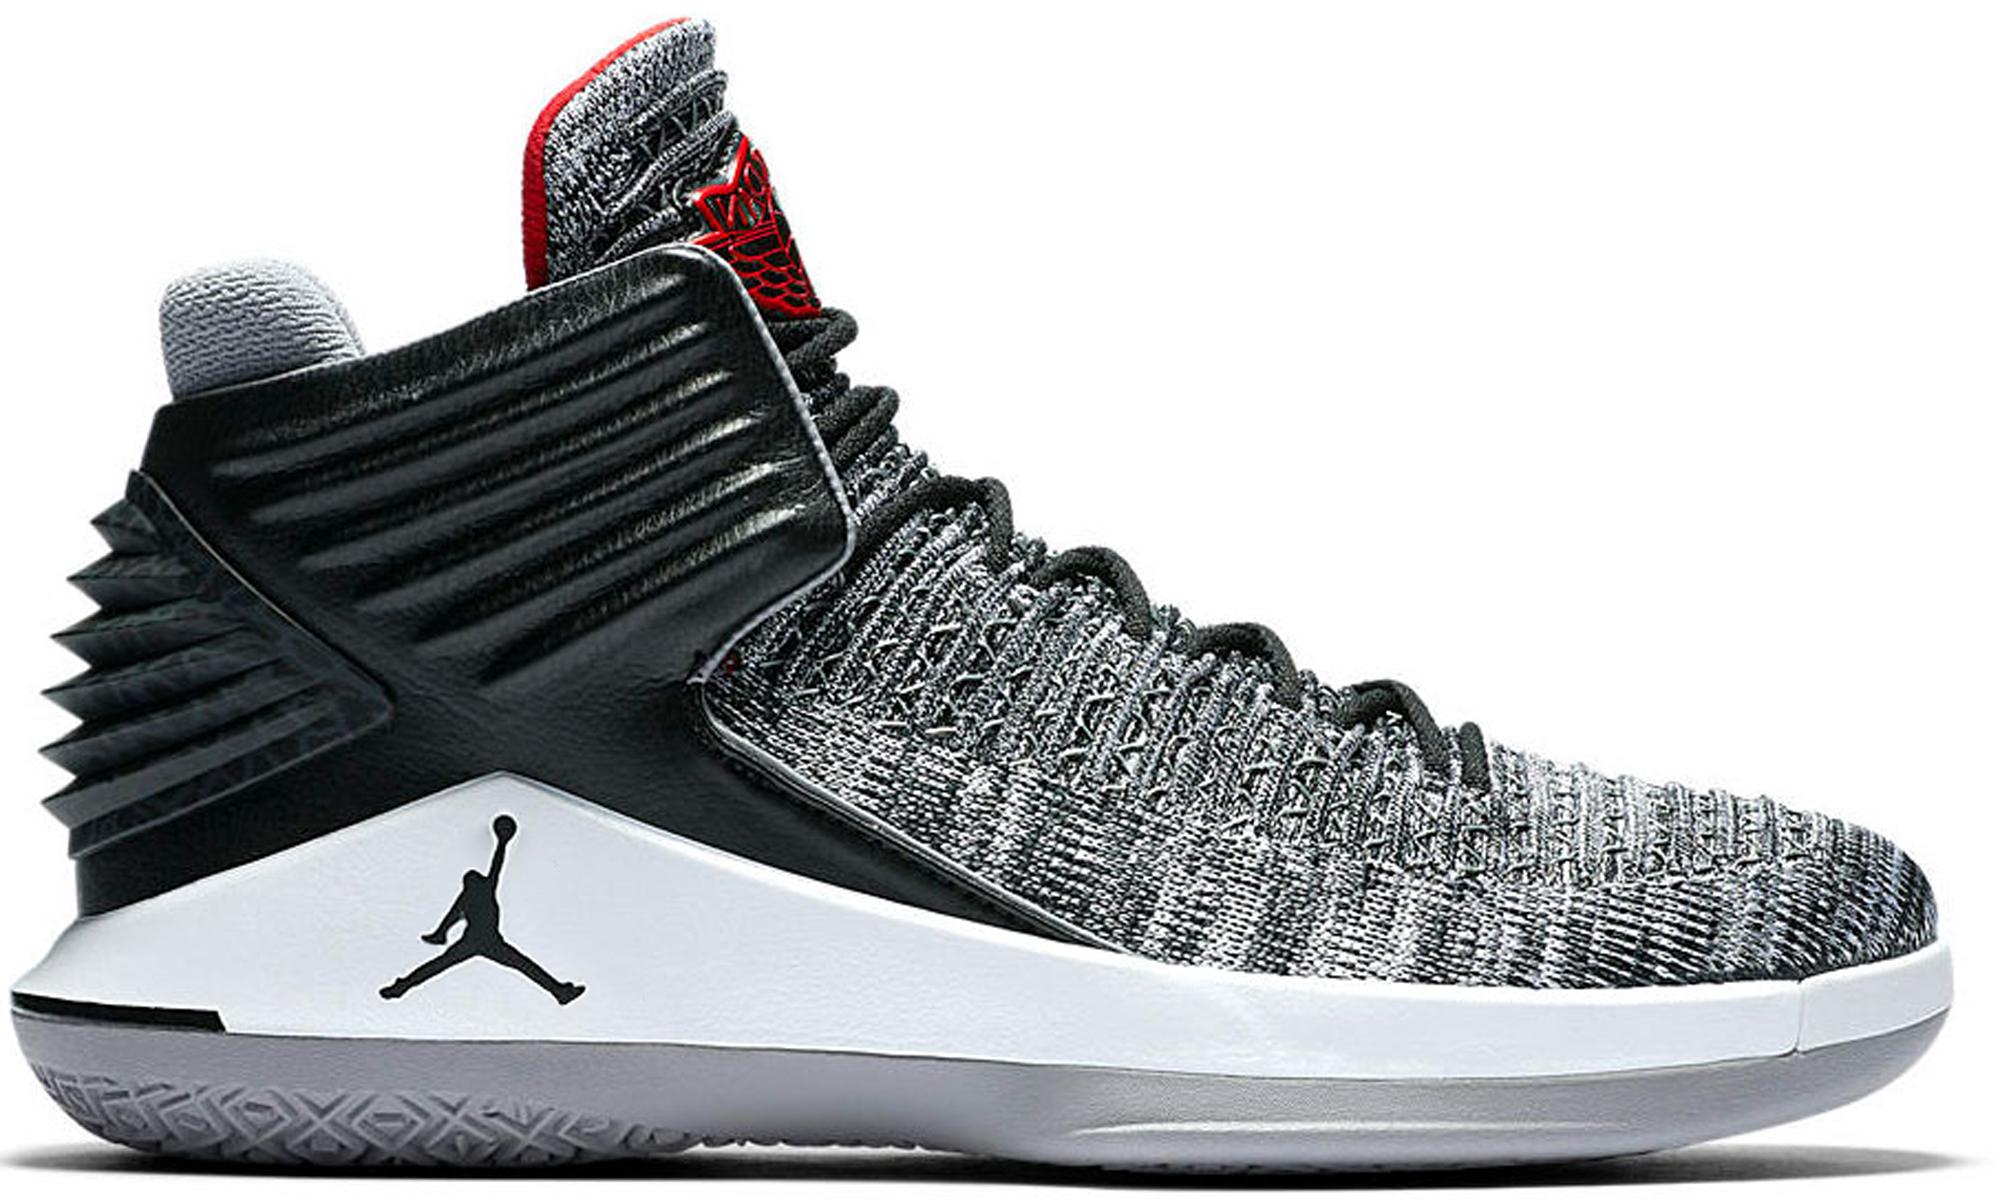 e6ed8e43615 Nike Air Jordan XXXII 32 Retro Women Basketball Shoes Black Brown ...